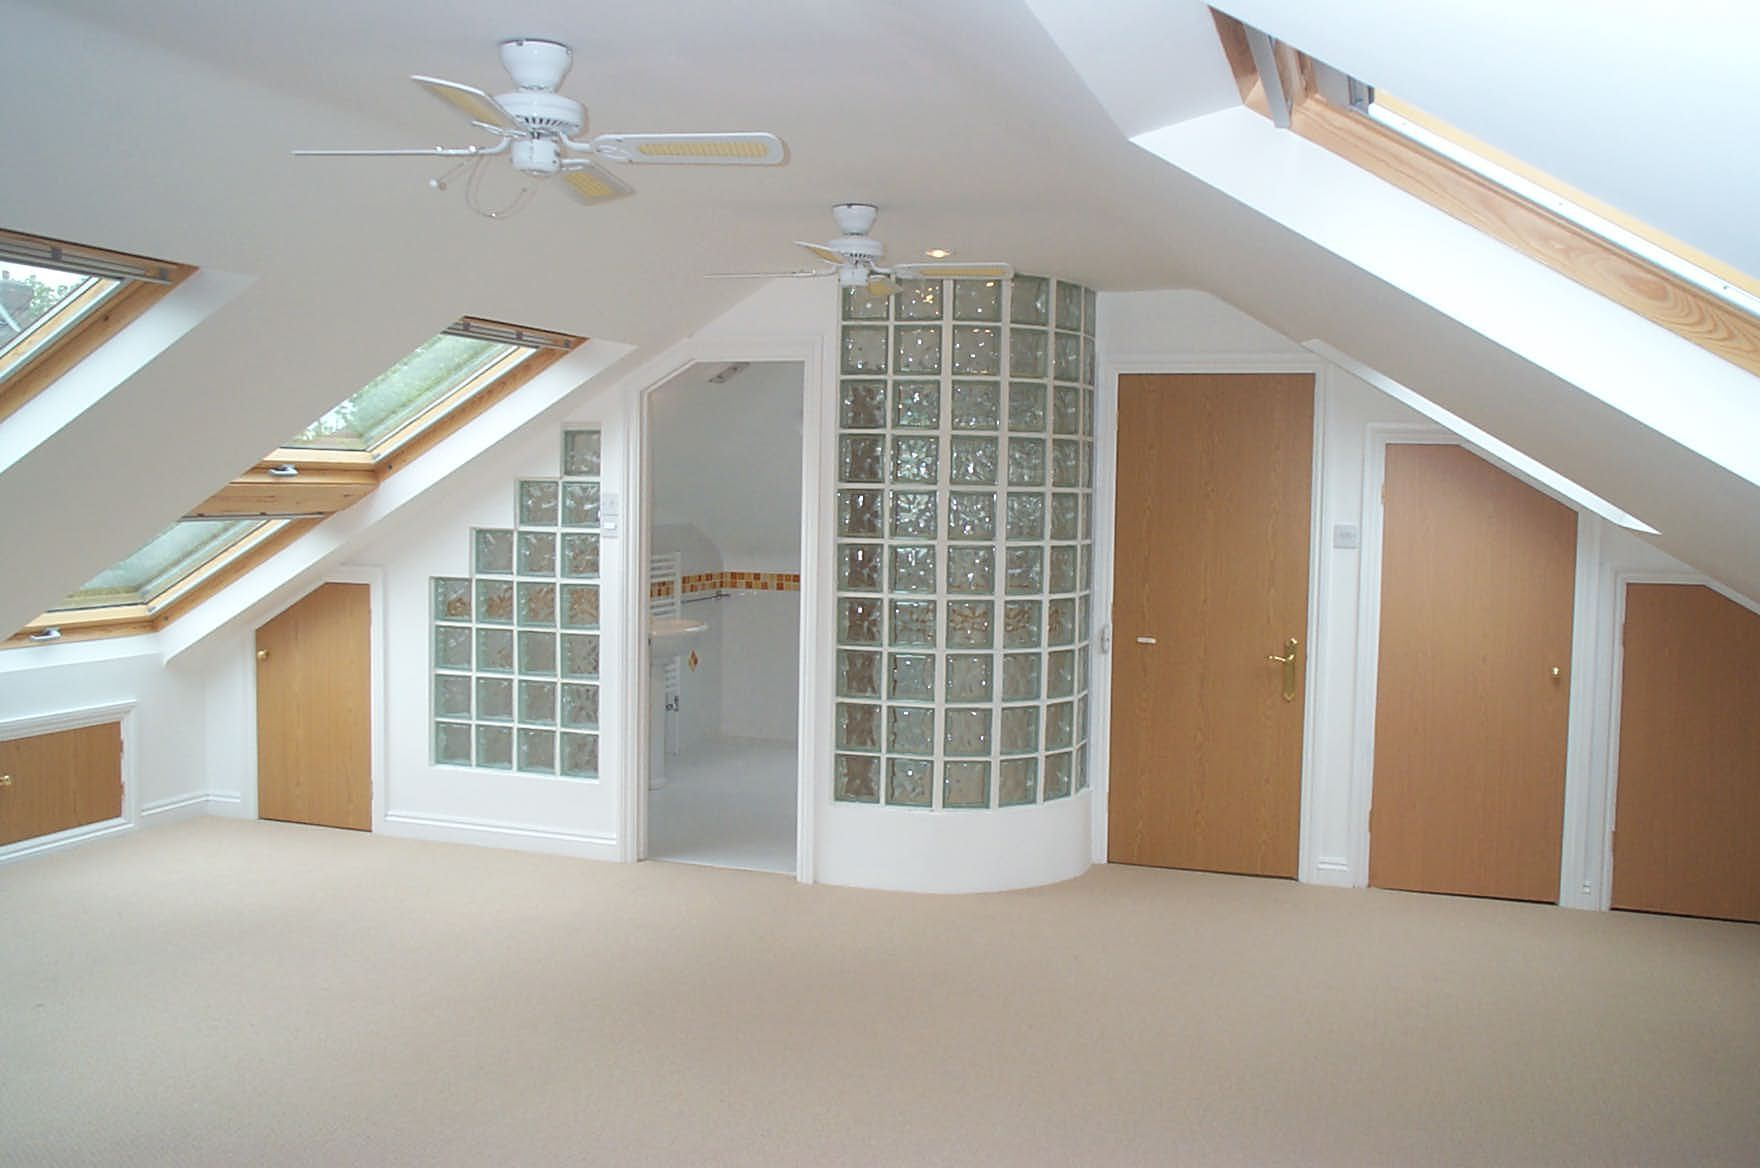 Attic Conversion For Bedroom With En Suite My Future